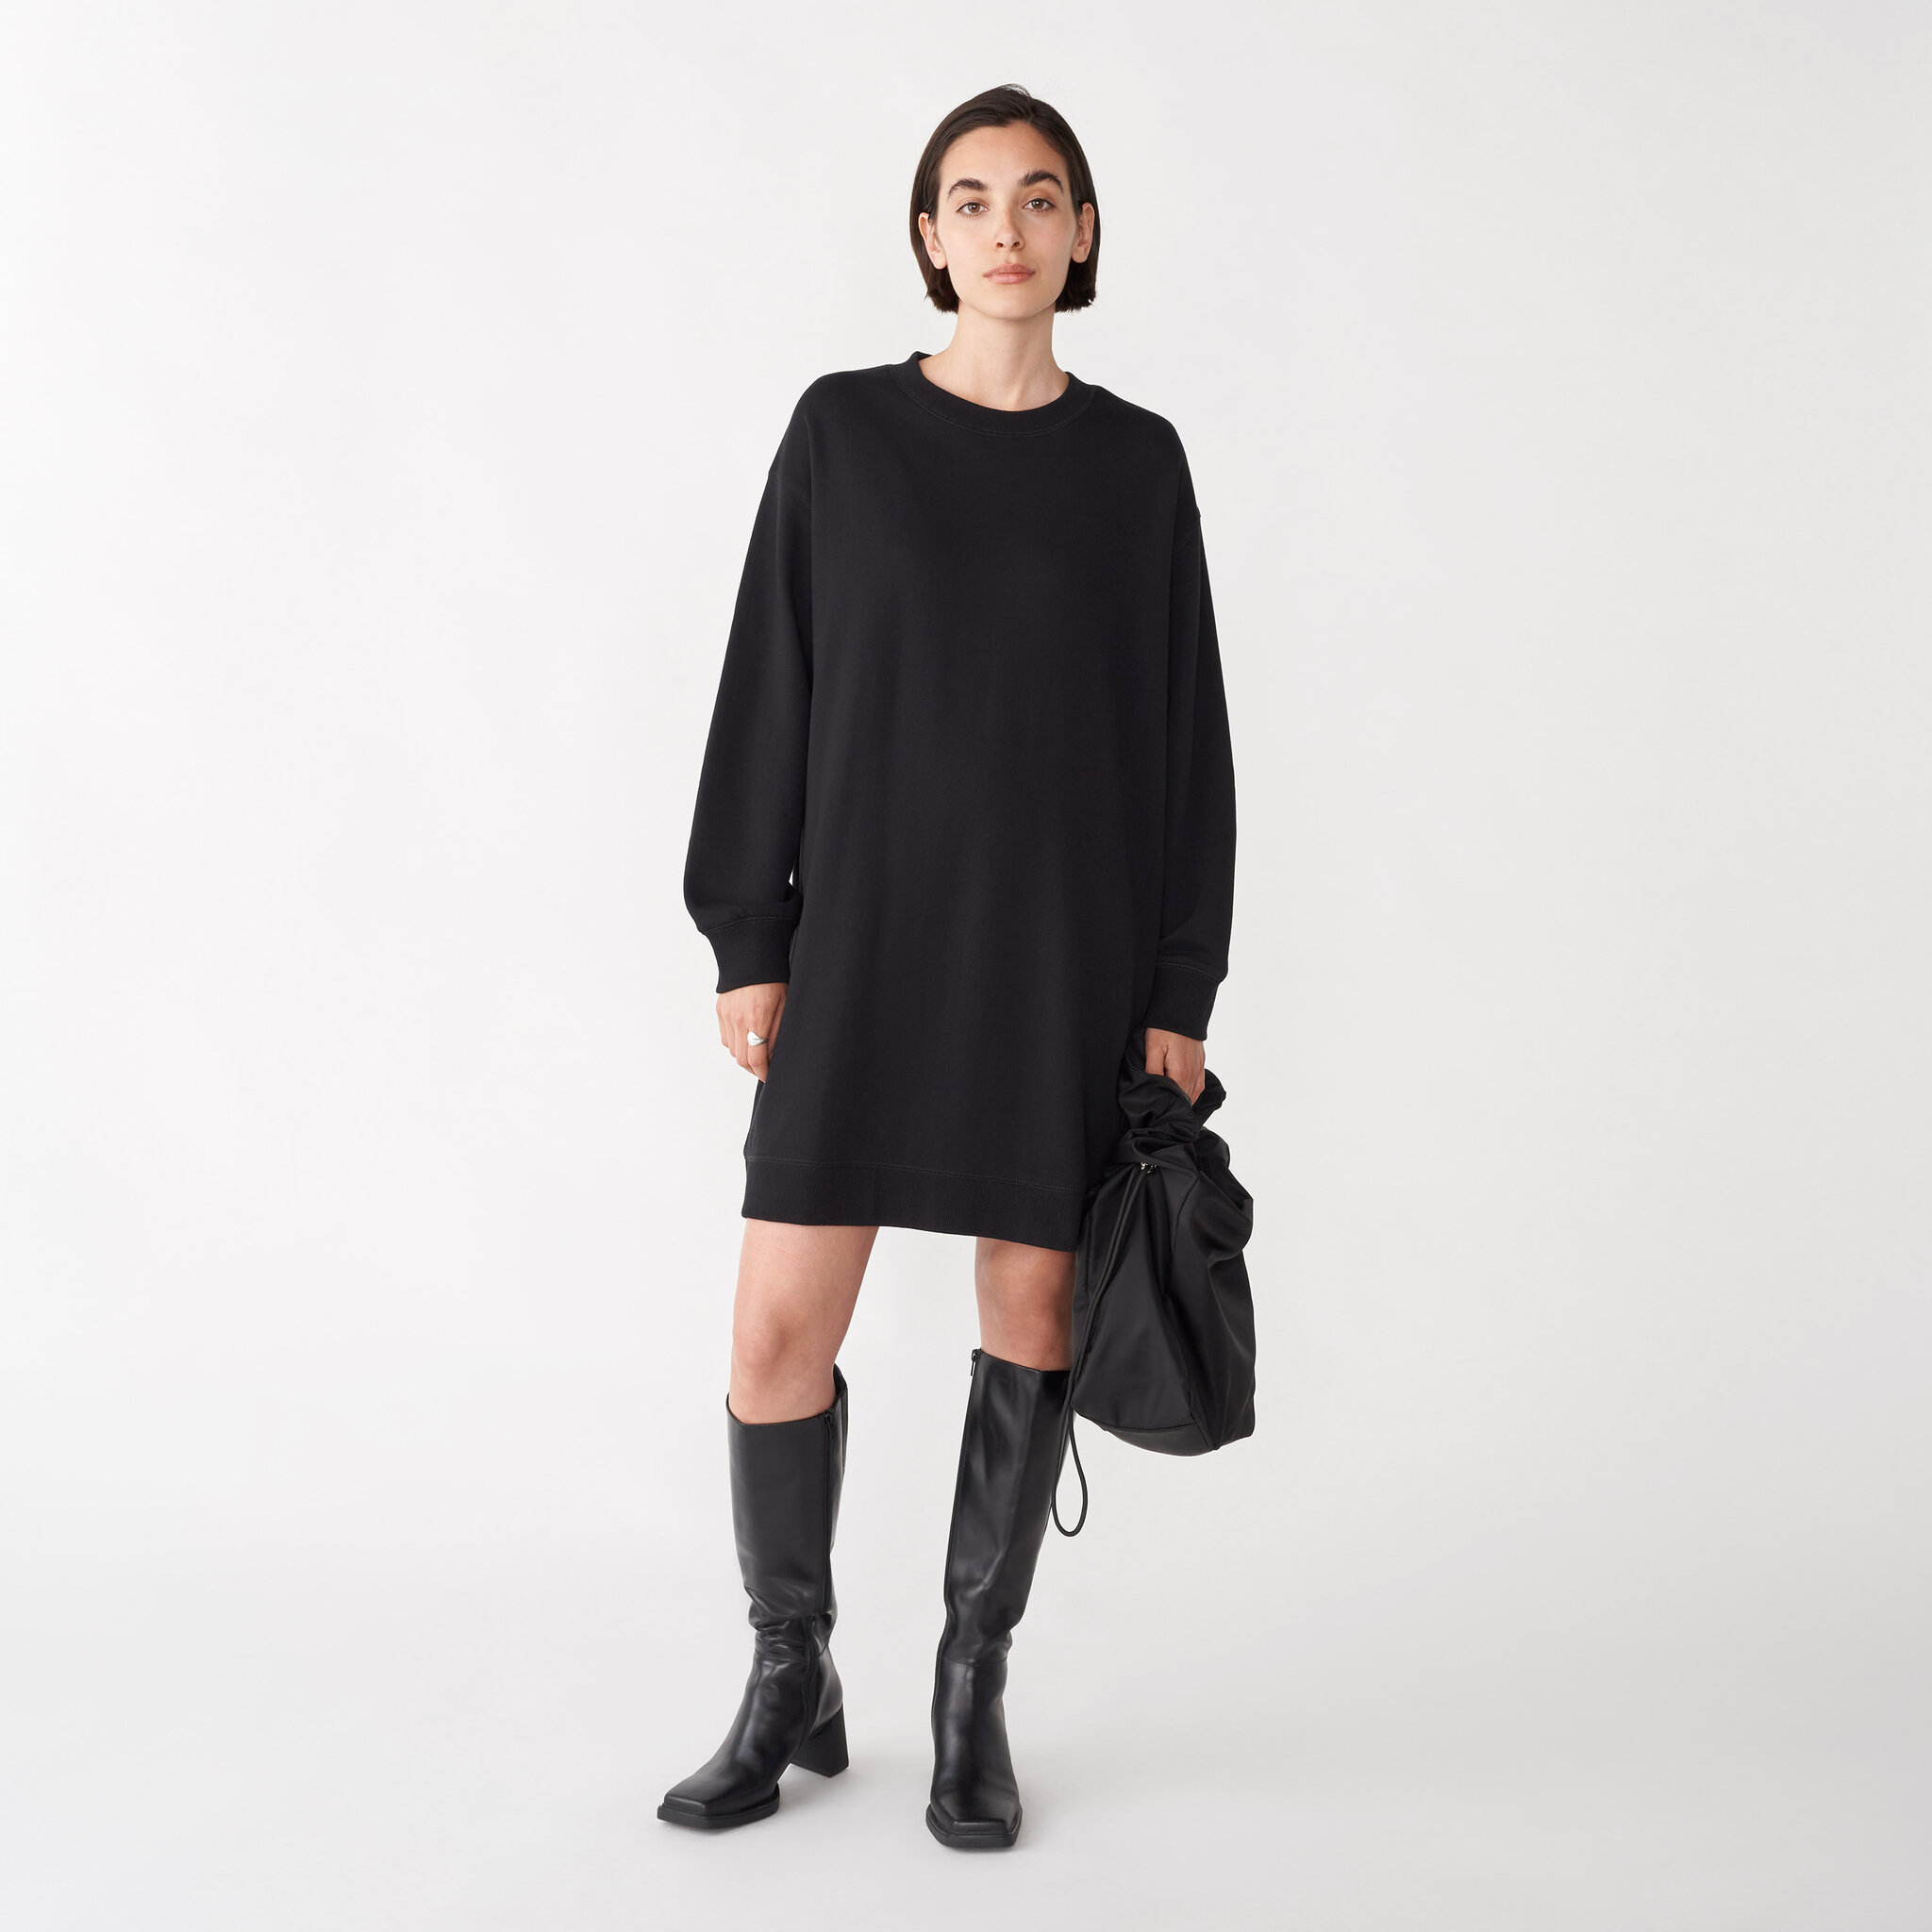 Sweaterdress NASIN